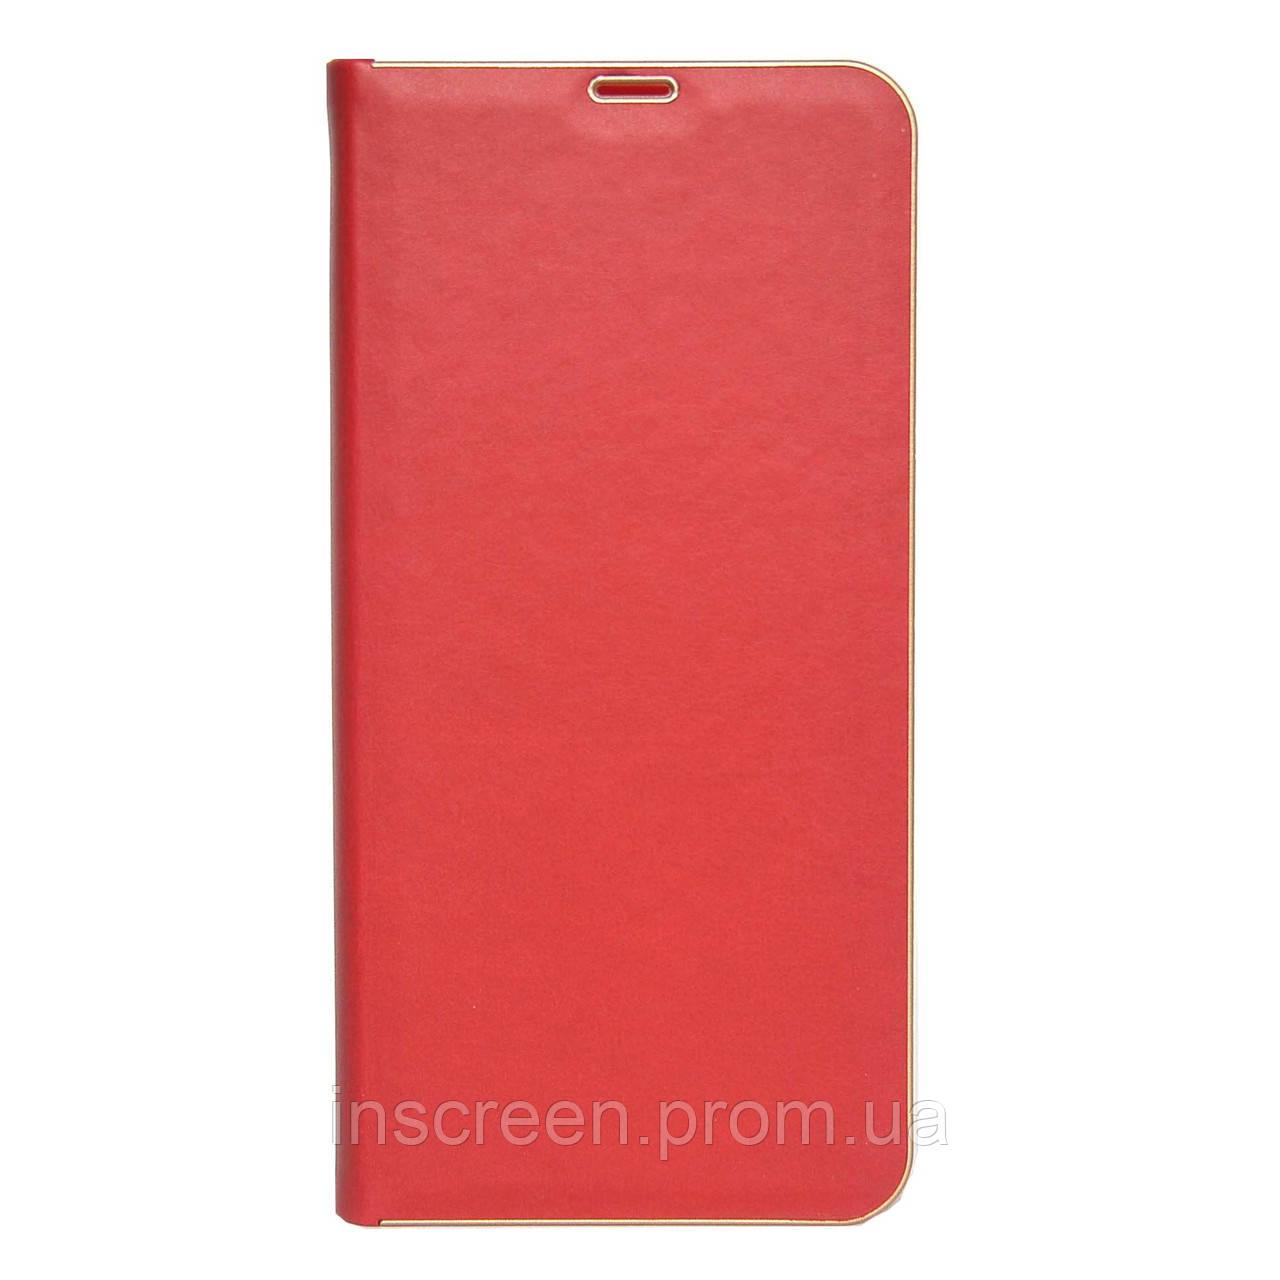 Чехол-книжка Florence TOP 2 Xiaomi Redmi Note 9S, Note 9 Pro под кожу красный